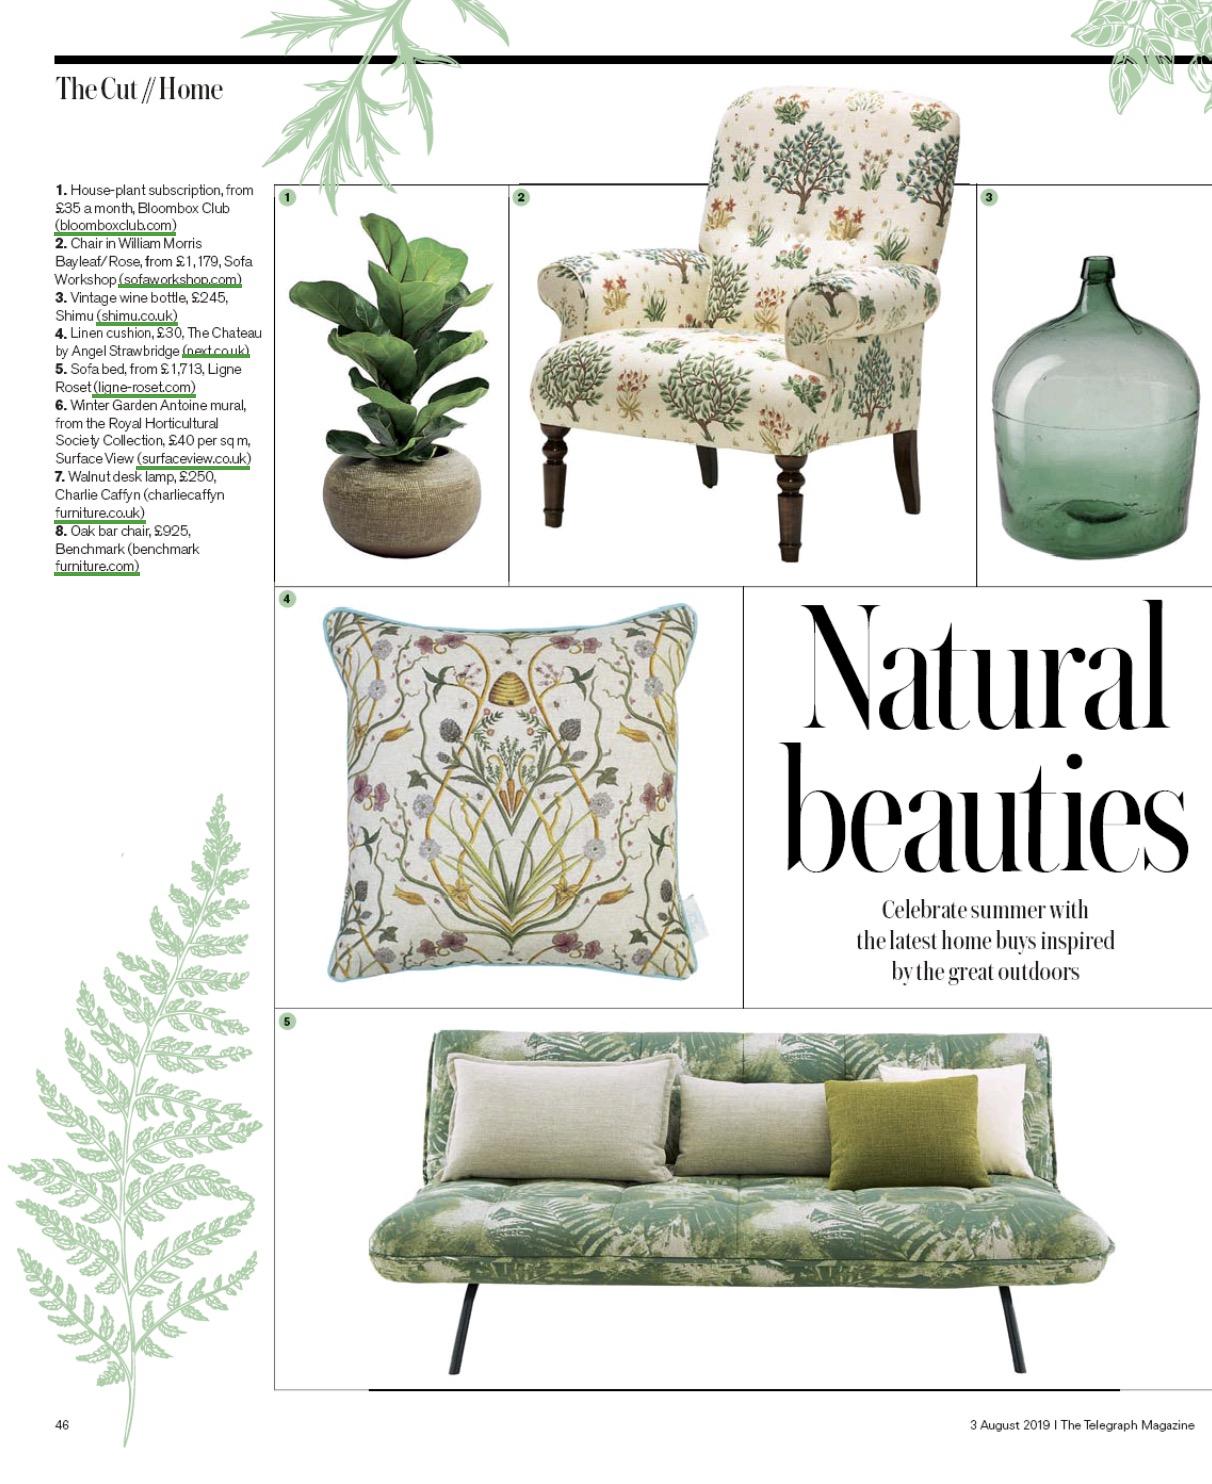 The Telegraph Magazine 03-08-2019 Bloombox Club.jpg